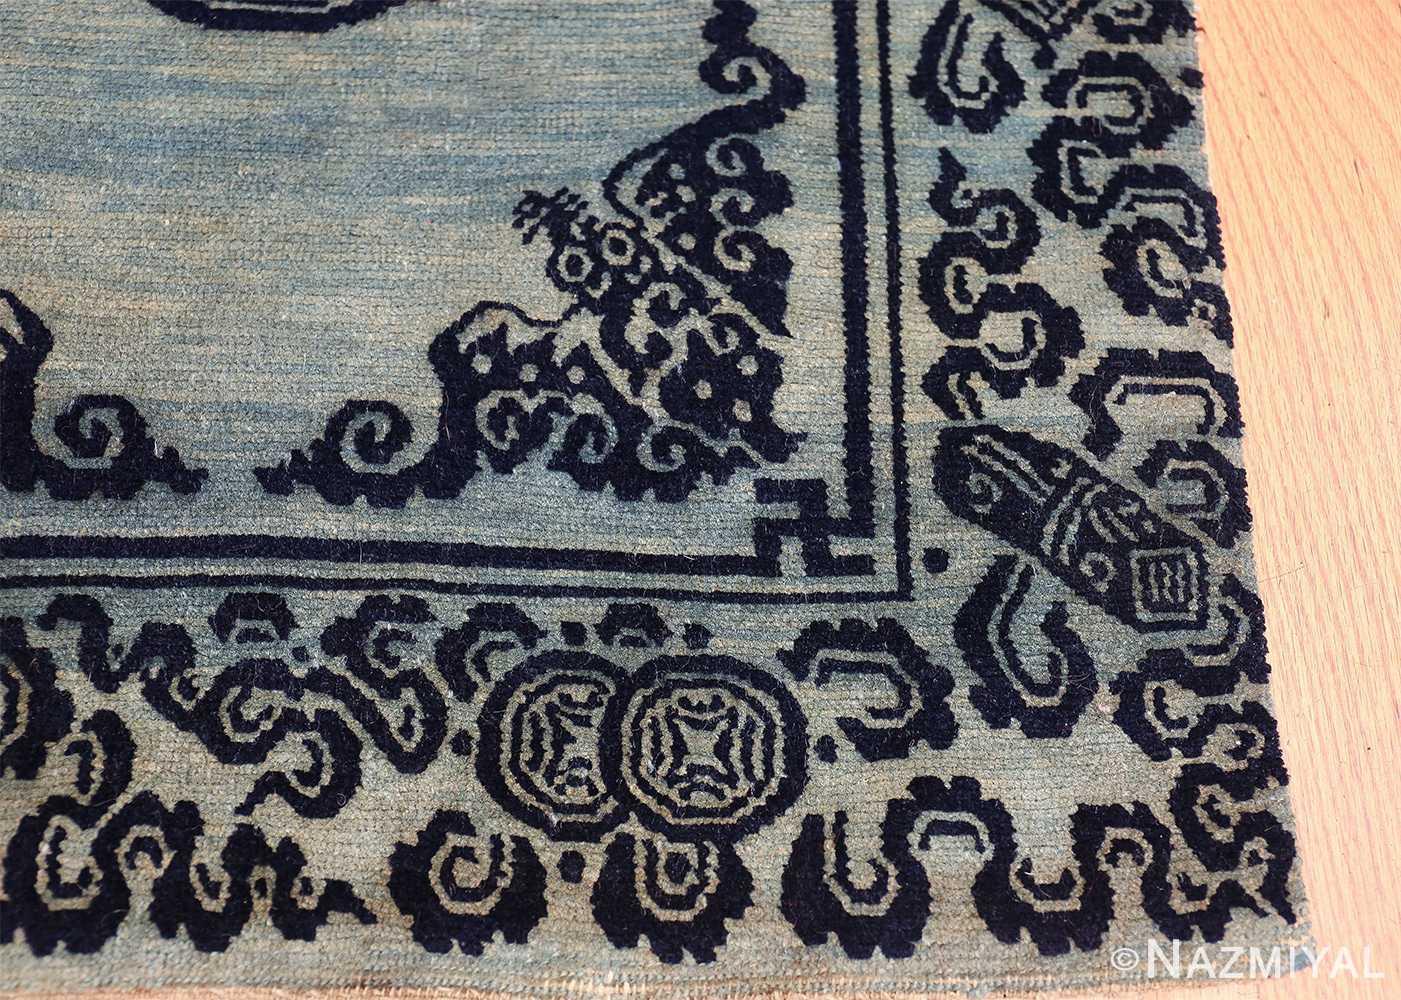 Antique Blue Background Tibetan Rug 49795 corner design Nazmiyal